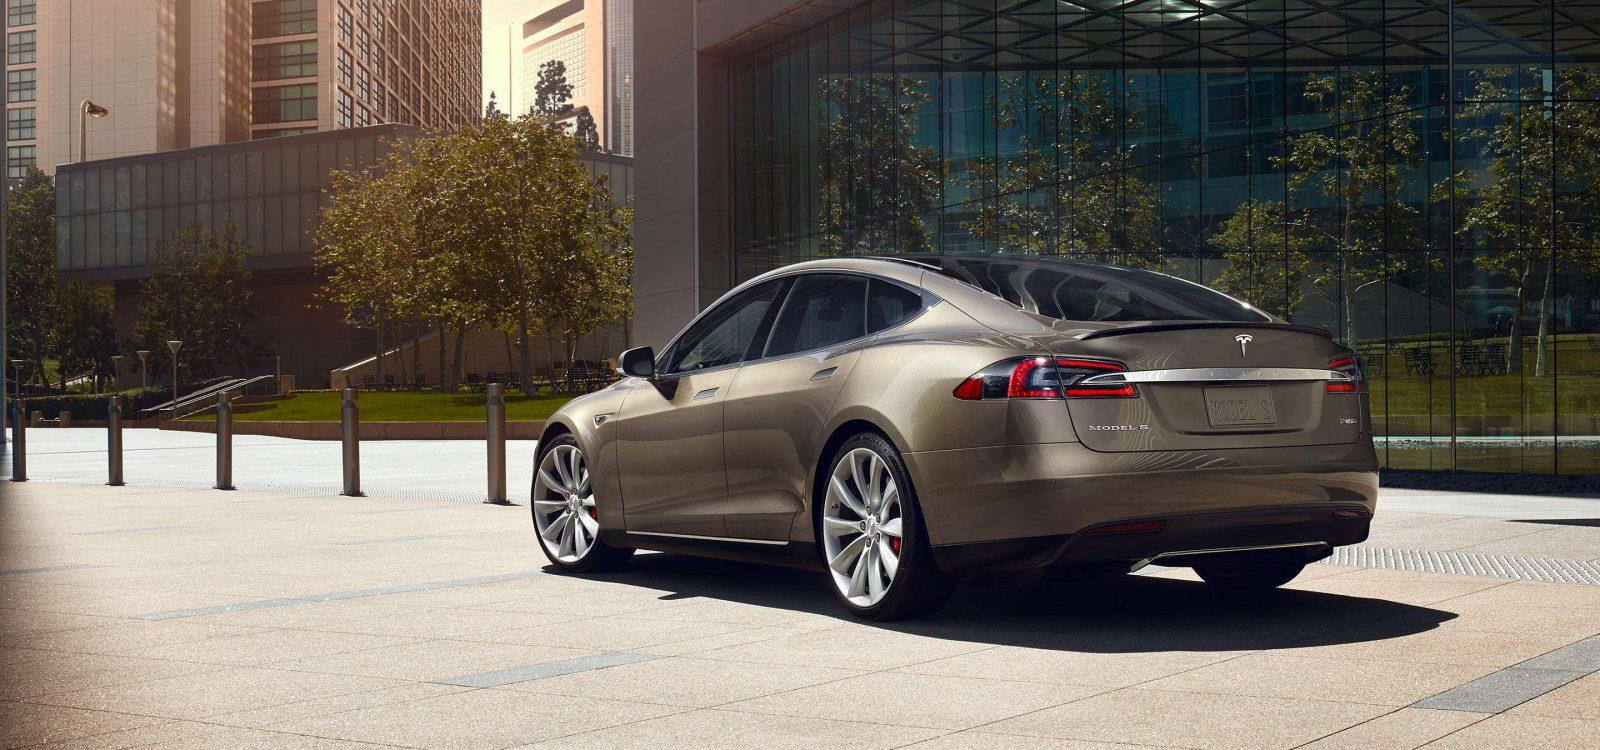 A Look At Tesla Model S Deliveries In Europe November 2015